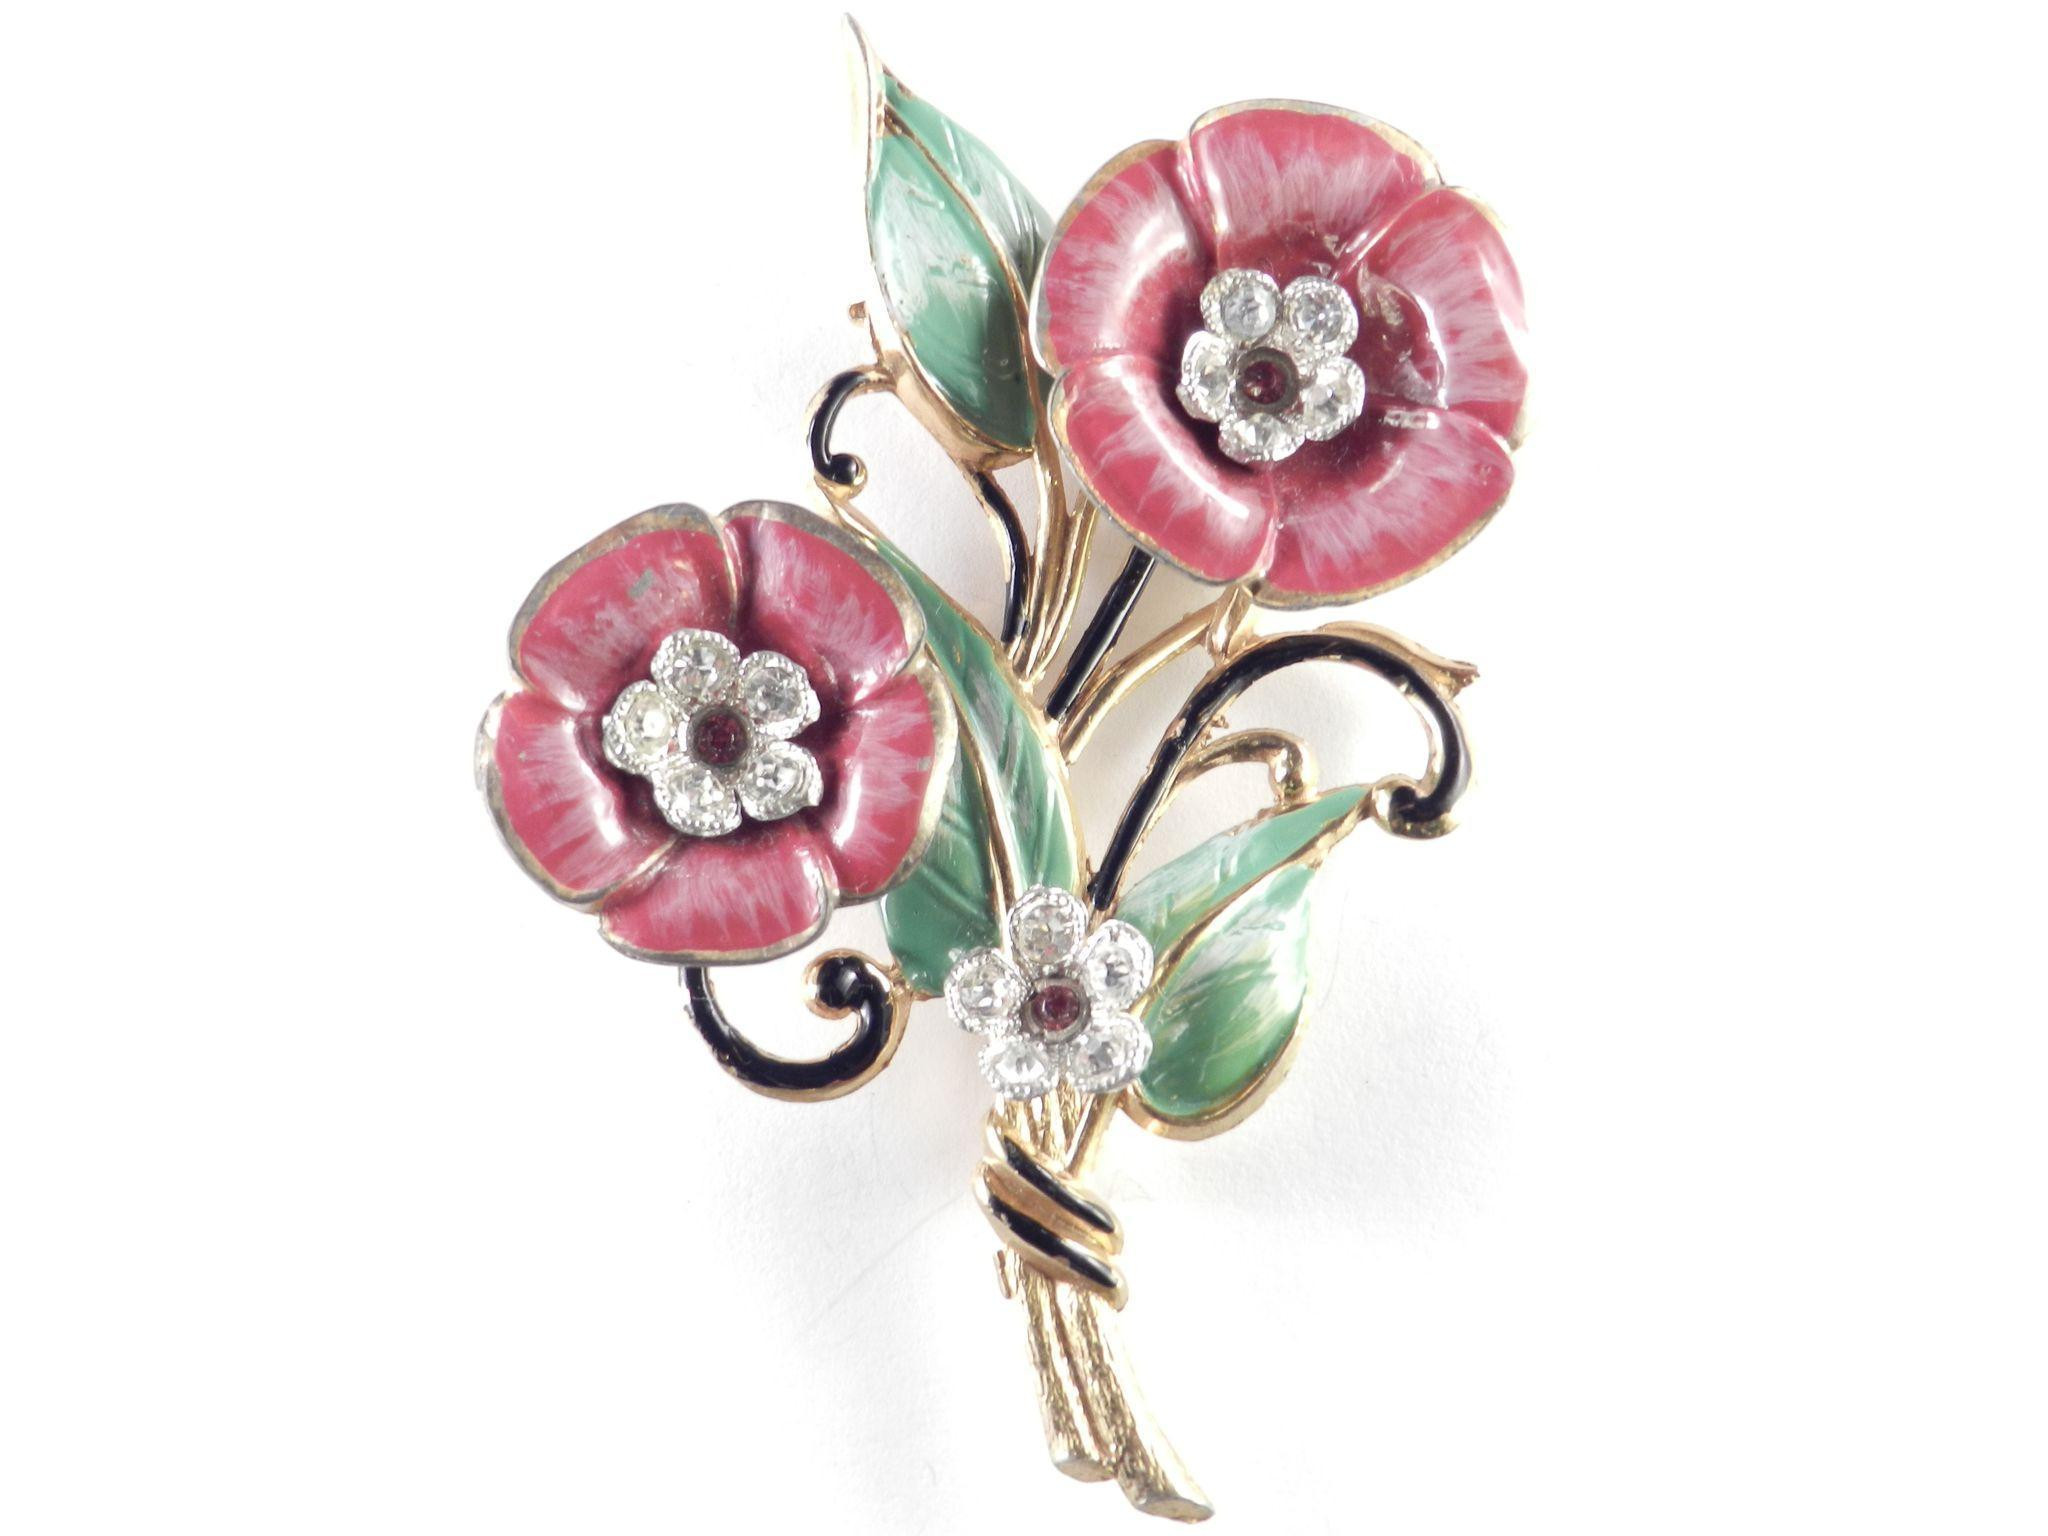 Metal Brooches  Enamel Rhinestone Pot Metal Flower Brooch Pin from